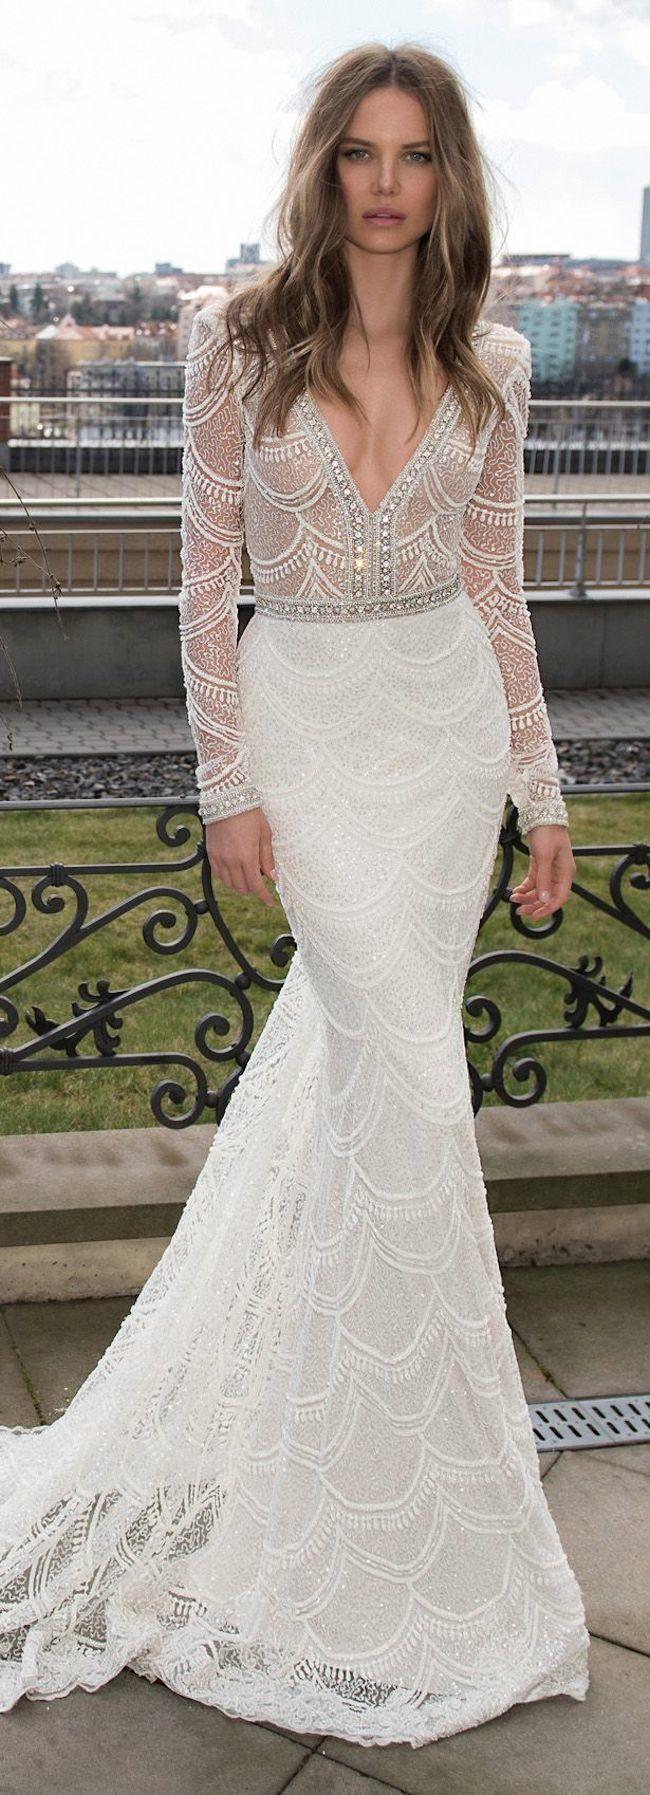 wedding dresses games long dresses for weddings Stunning Long Sleeve Wedding Dresses